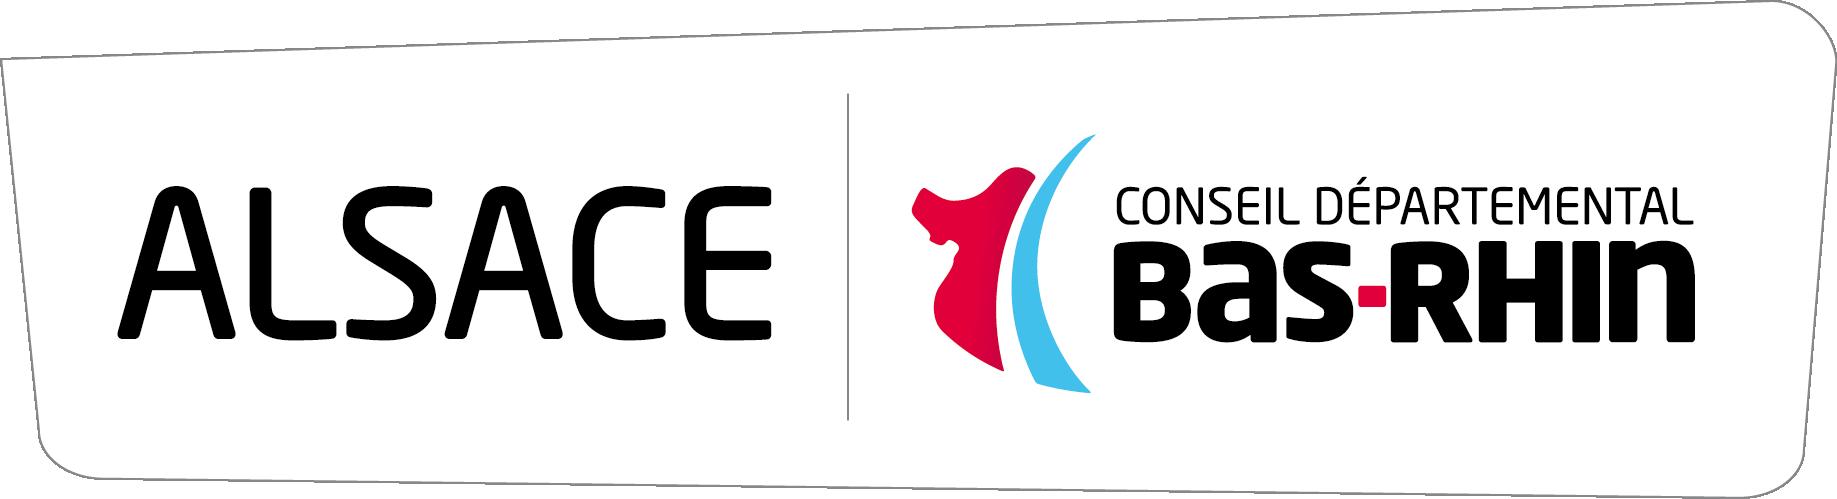 Logo du conseil départemental du Bas-Rhin CD67